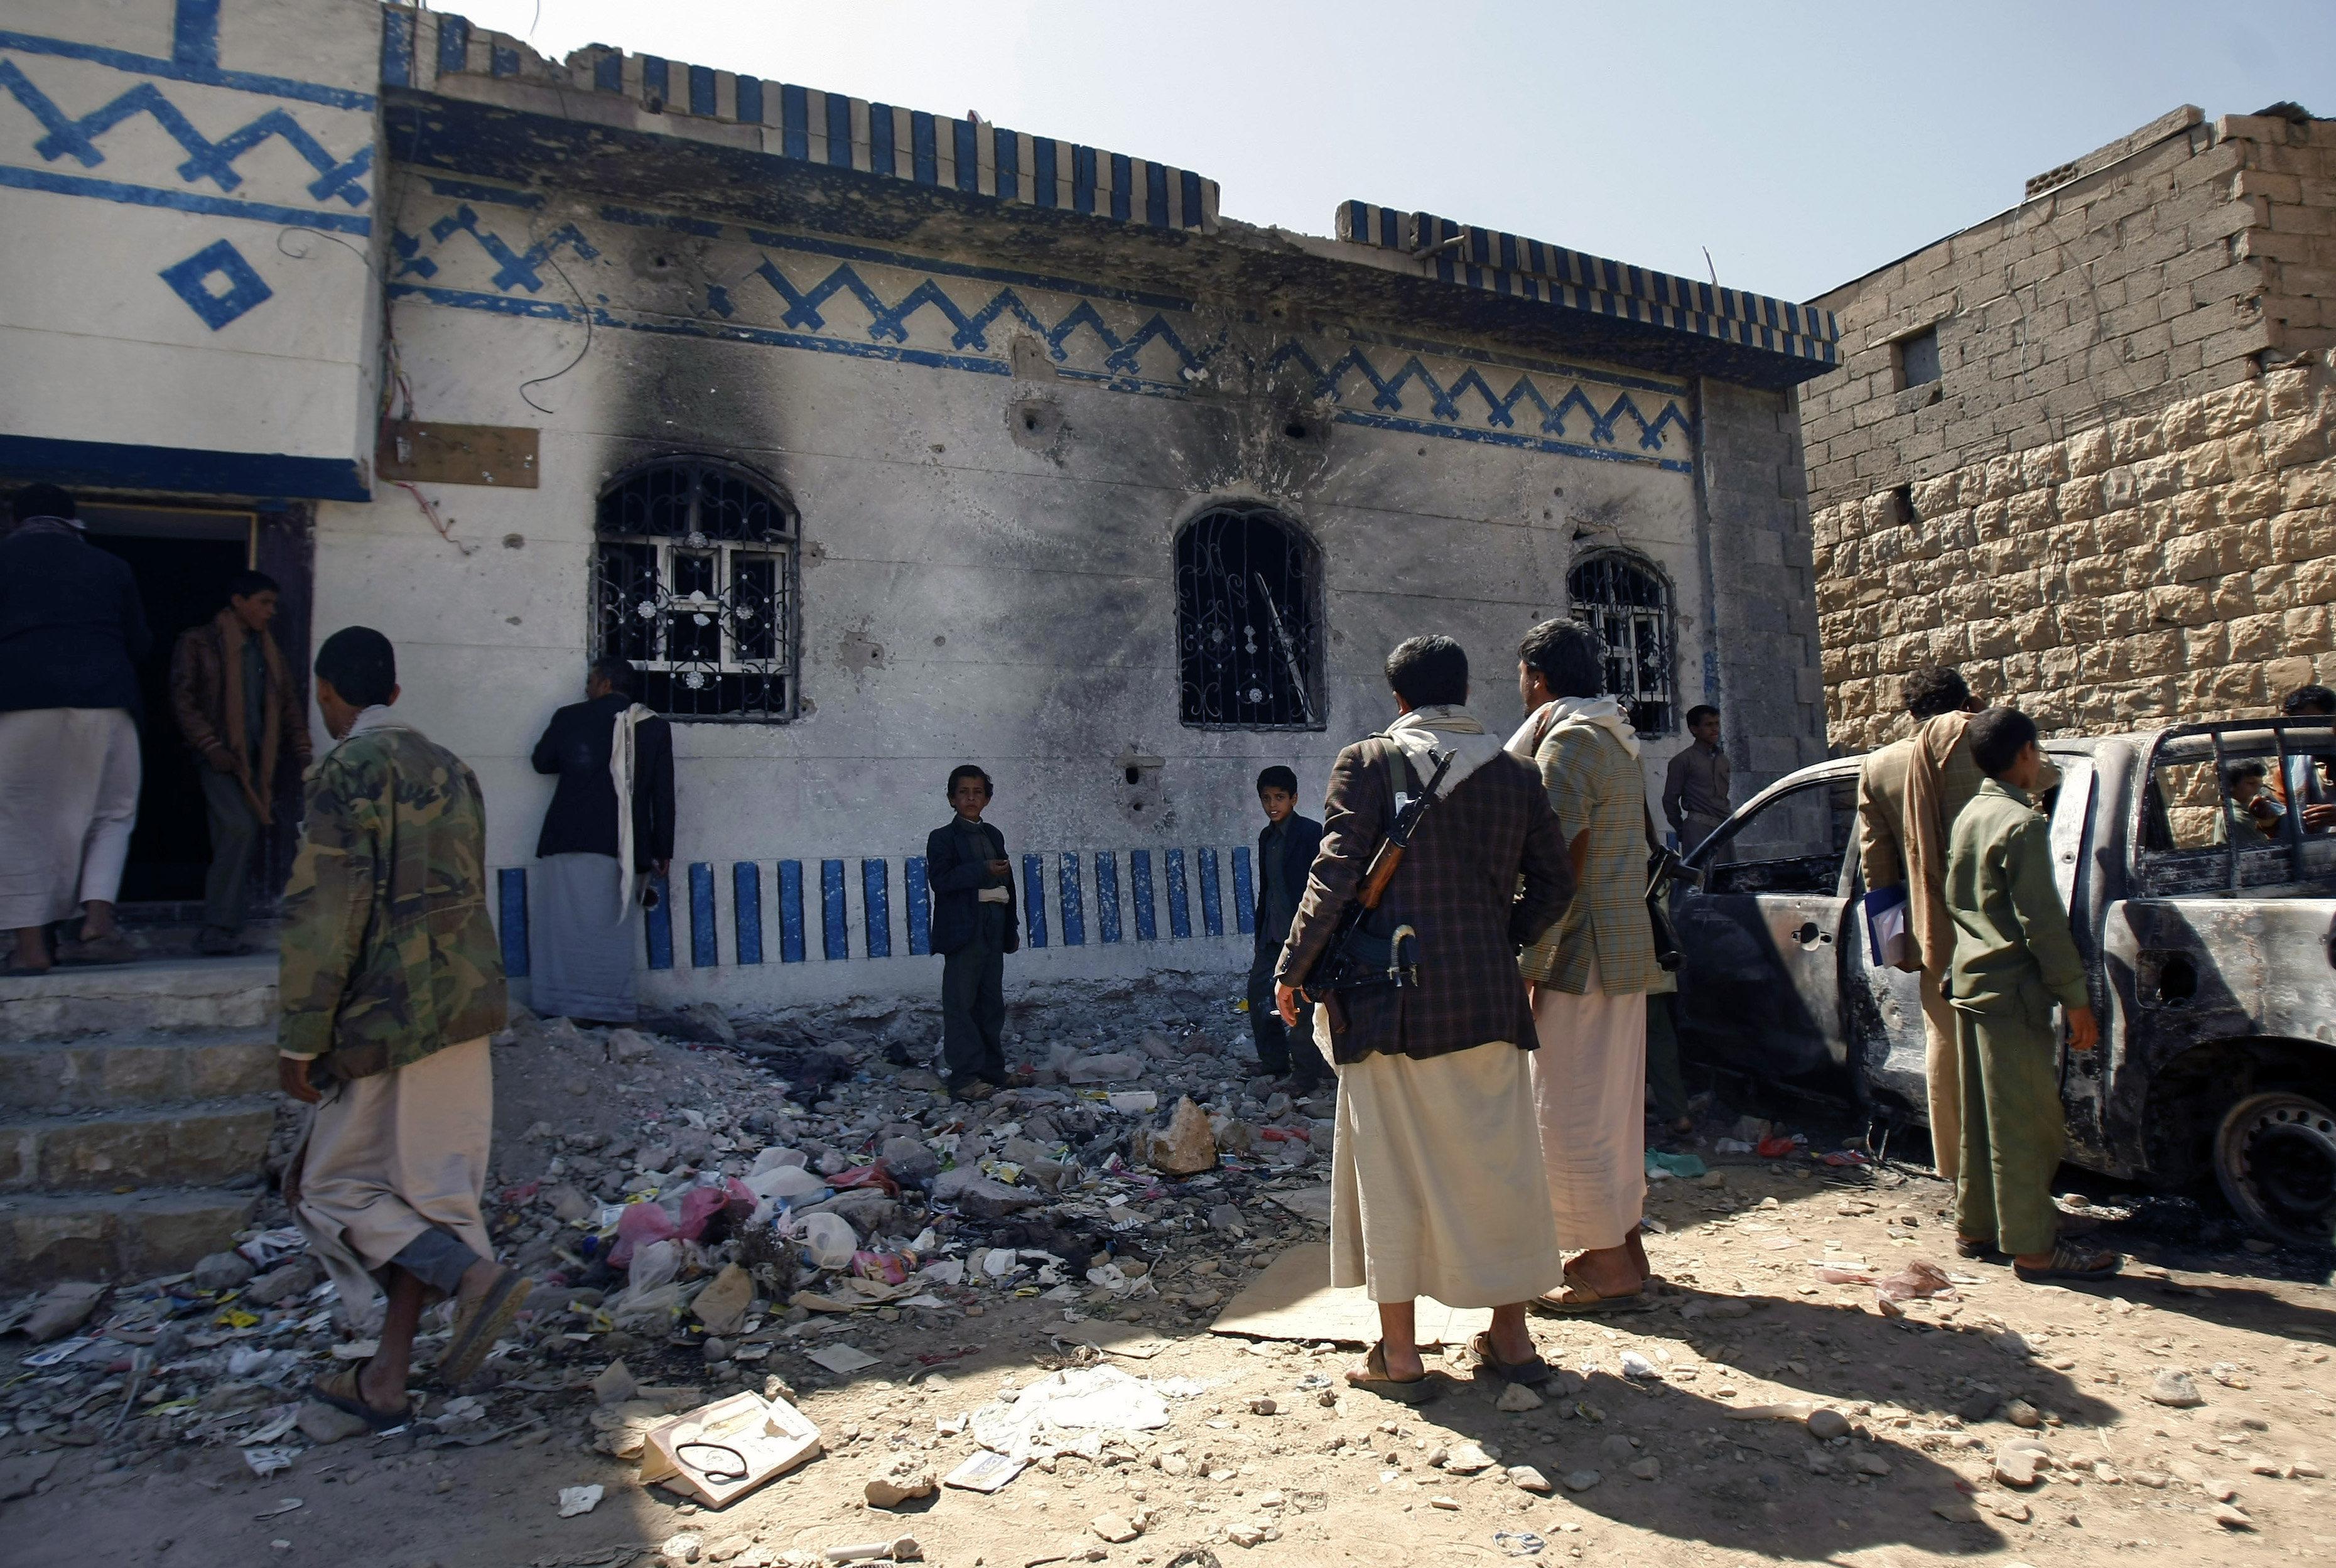 Yemenis look at a building damaged during a police raid on a hideout of al-Qaida militants in Arhab region, north of Sanaa, Yemen. (File)